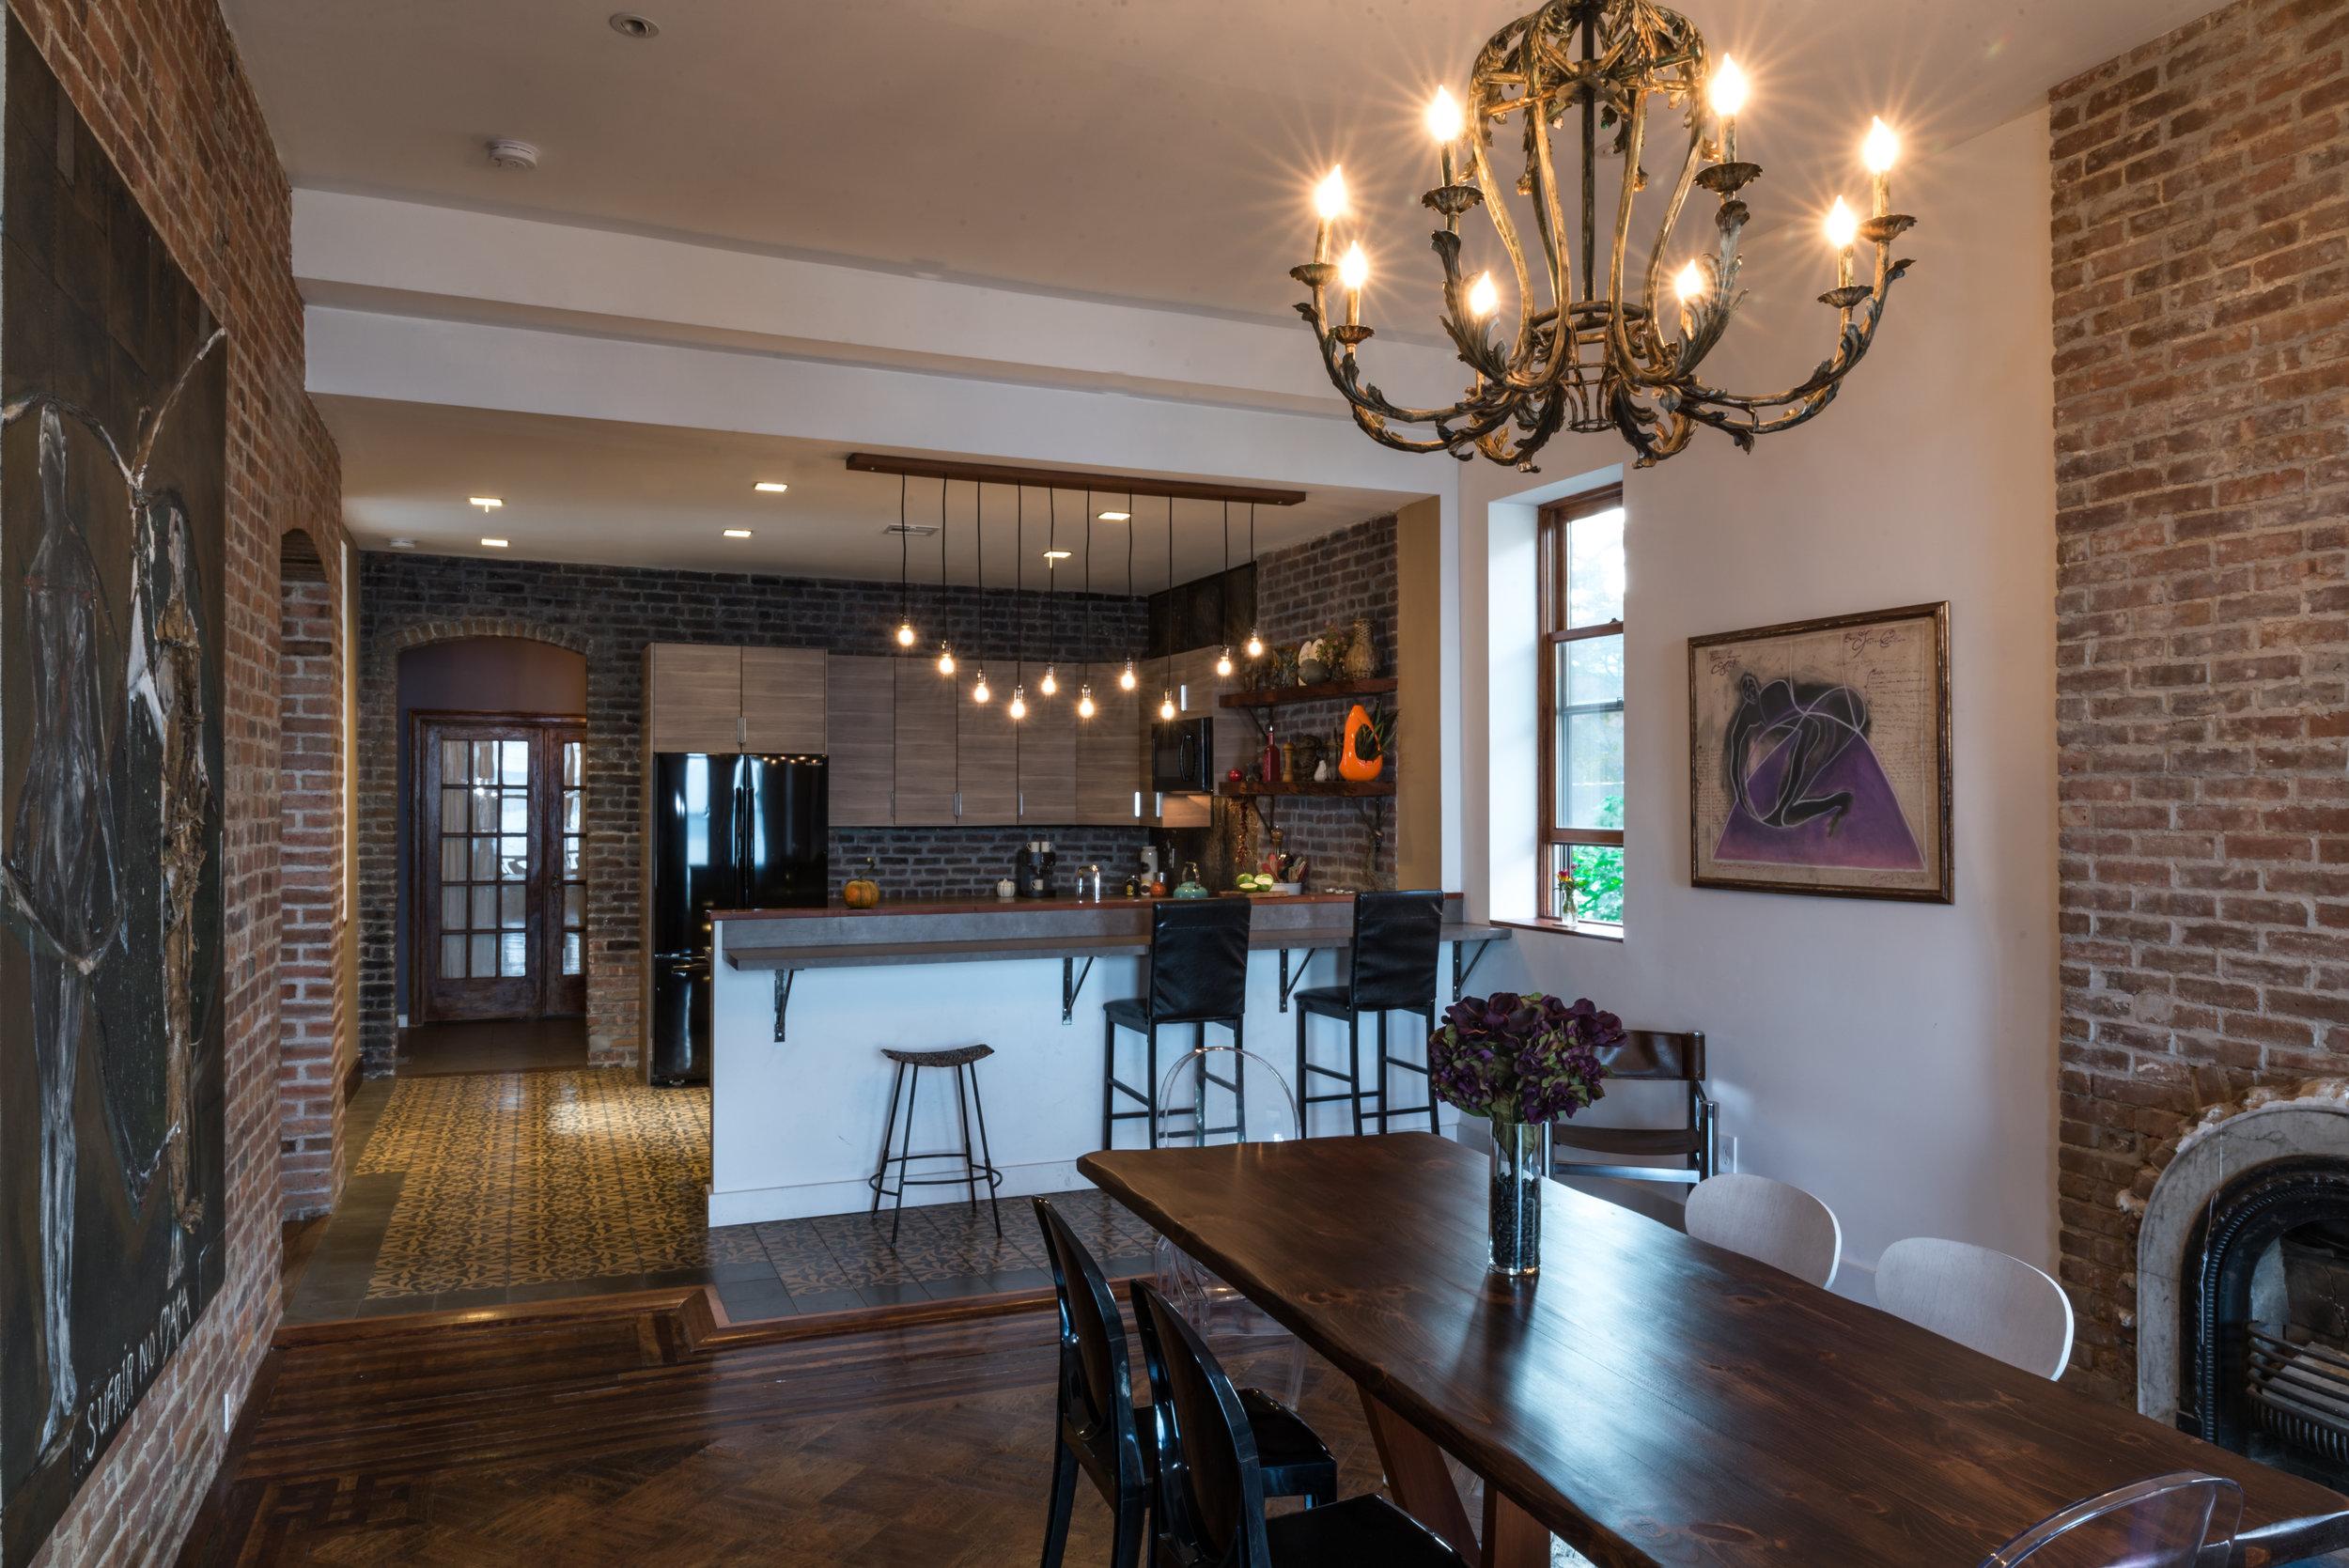 After_Casa_Hudson_Dining_Room_by_Dorice_Arden.jpg